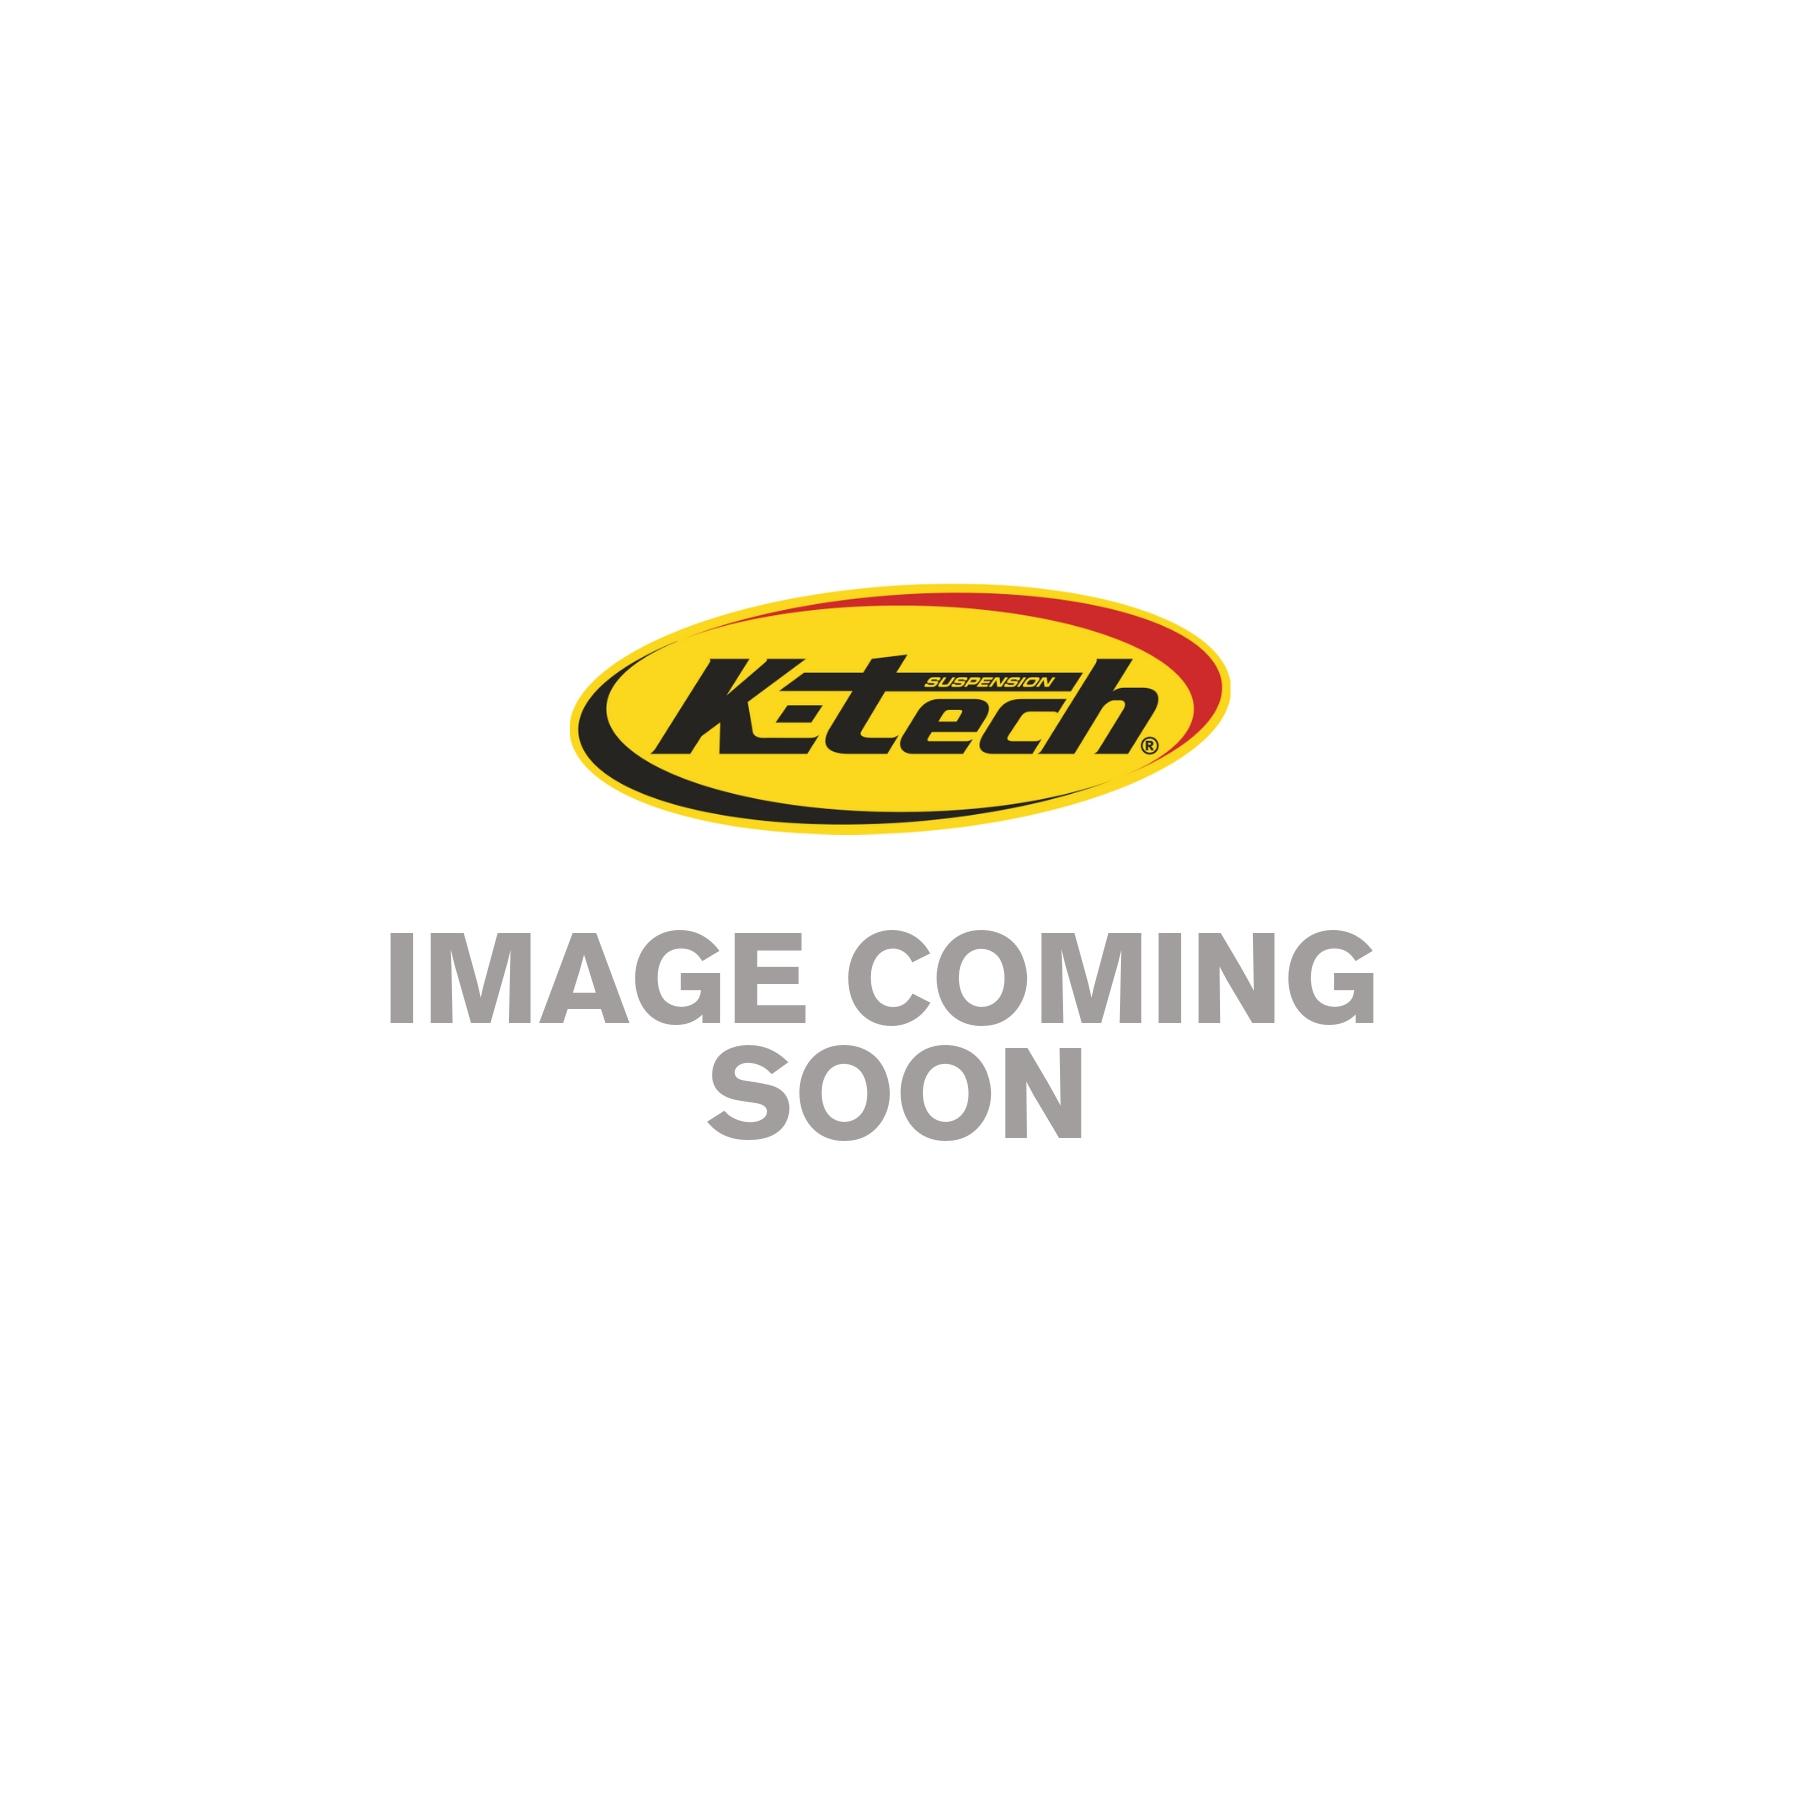 Shock Absorber Piston Bush (46x8.00x1.50) -Ohlins